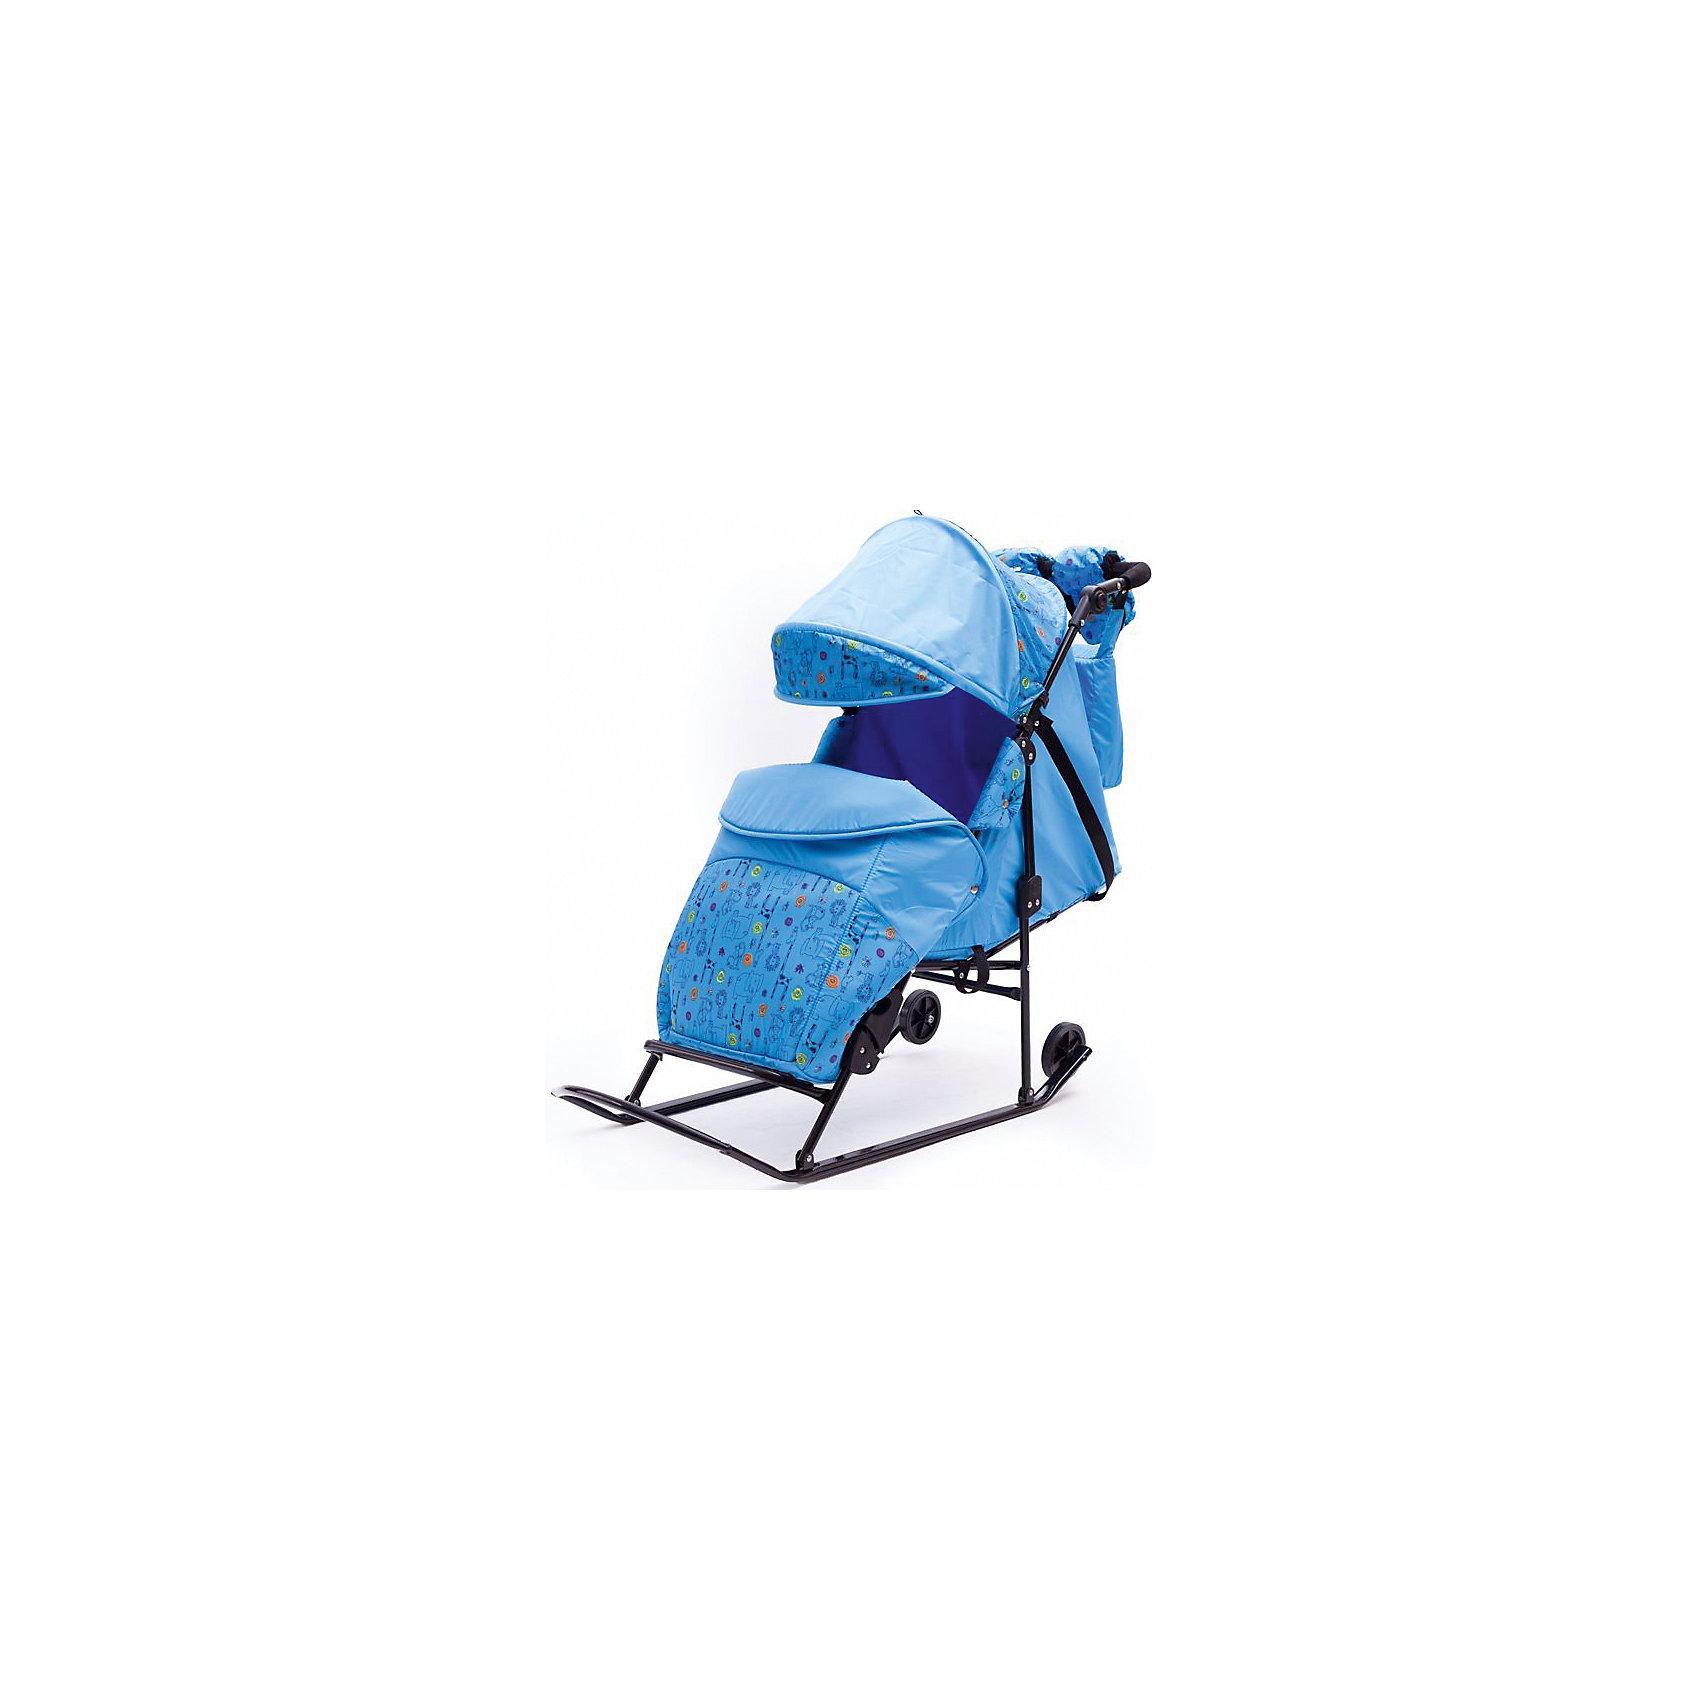 ABC Academy Санки-коляска Зимняя сказка 2В Авто, черная рама, ABC Academy, голубой/зоопарк abc design 2 в1 turbo s4f